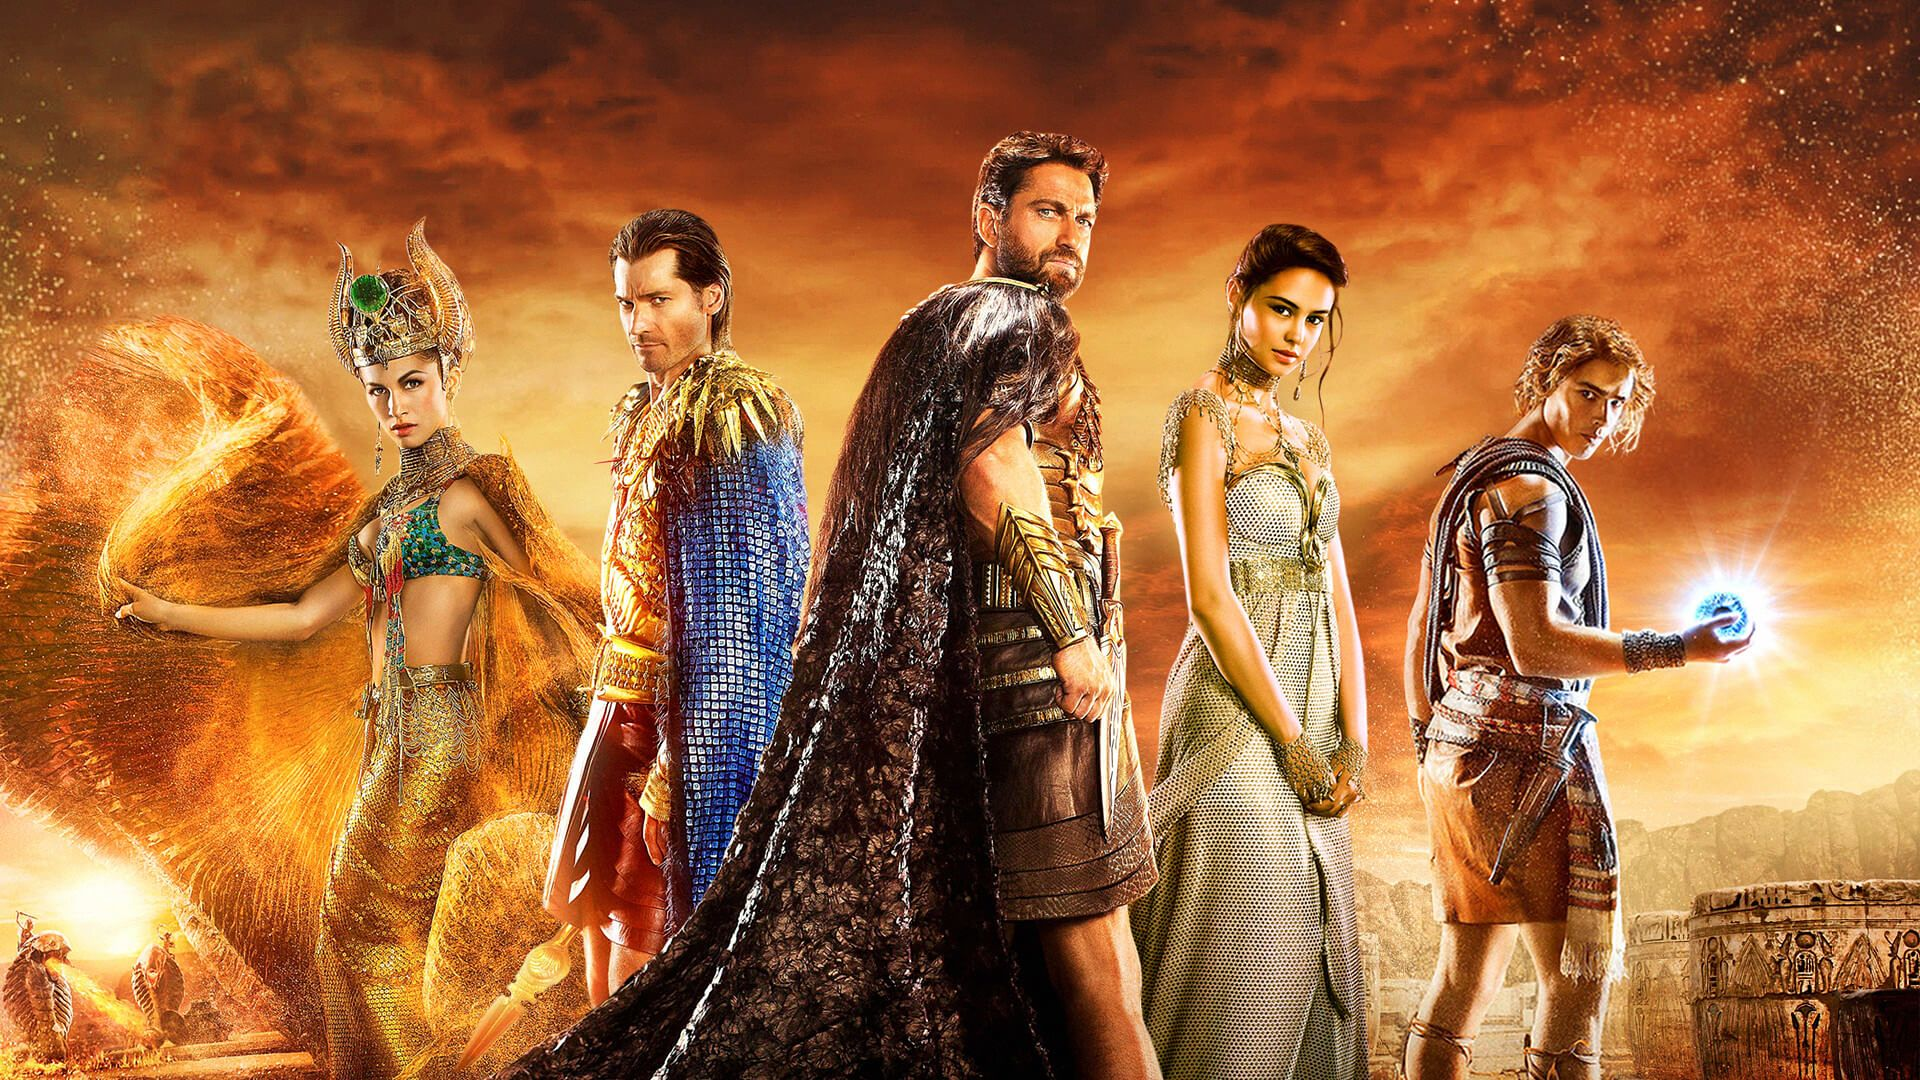 Gods of Egypt Film disponibile su Netflix – PlayBlog.it